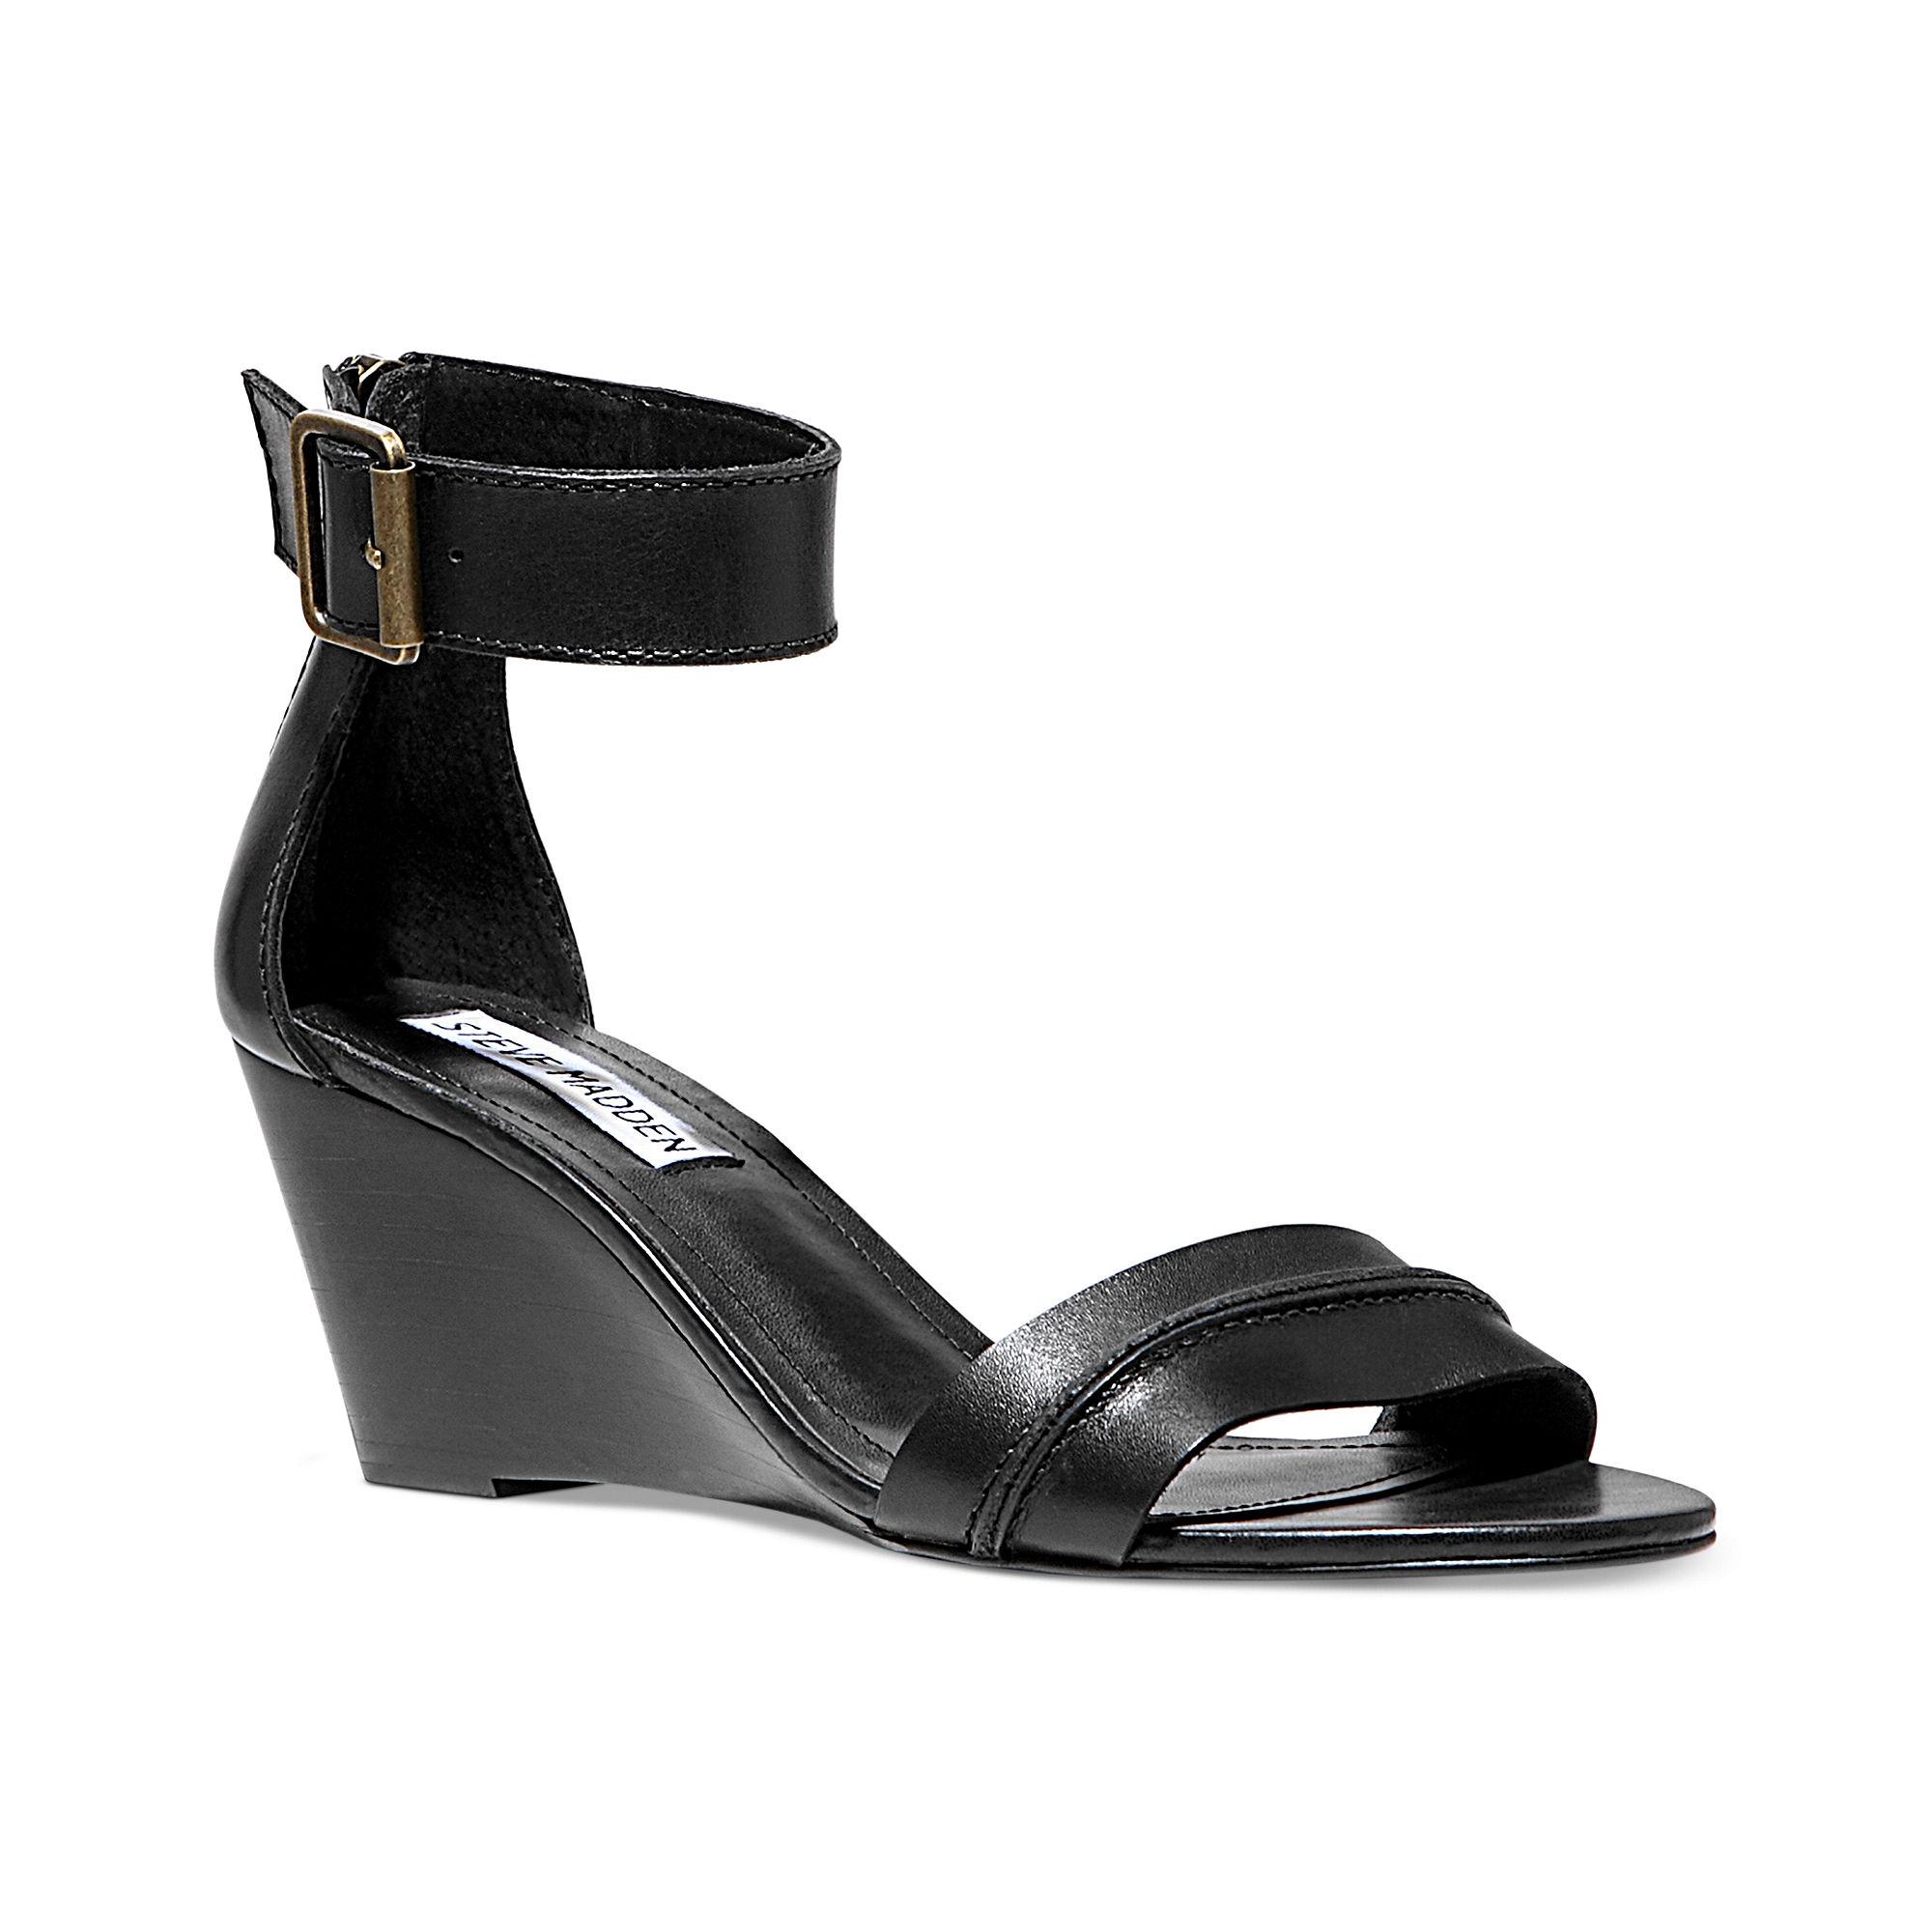 Steve Madden Neliee Wedge Sandals In Black Lyst